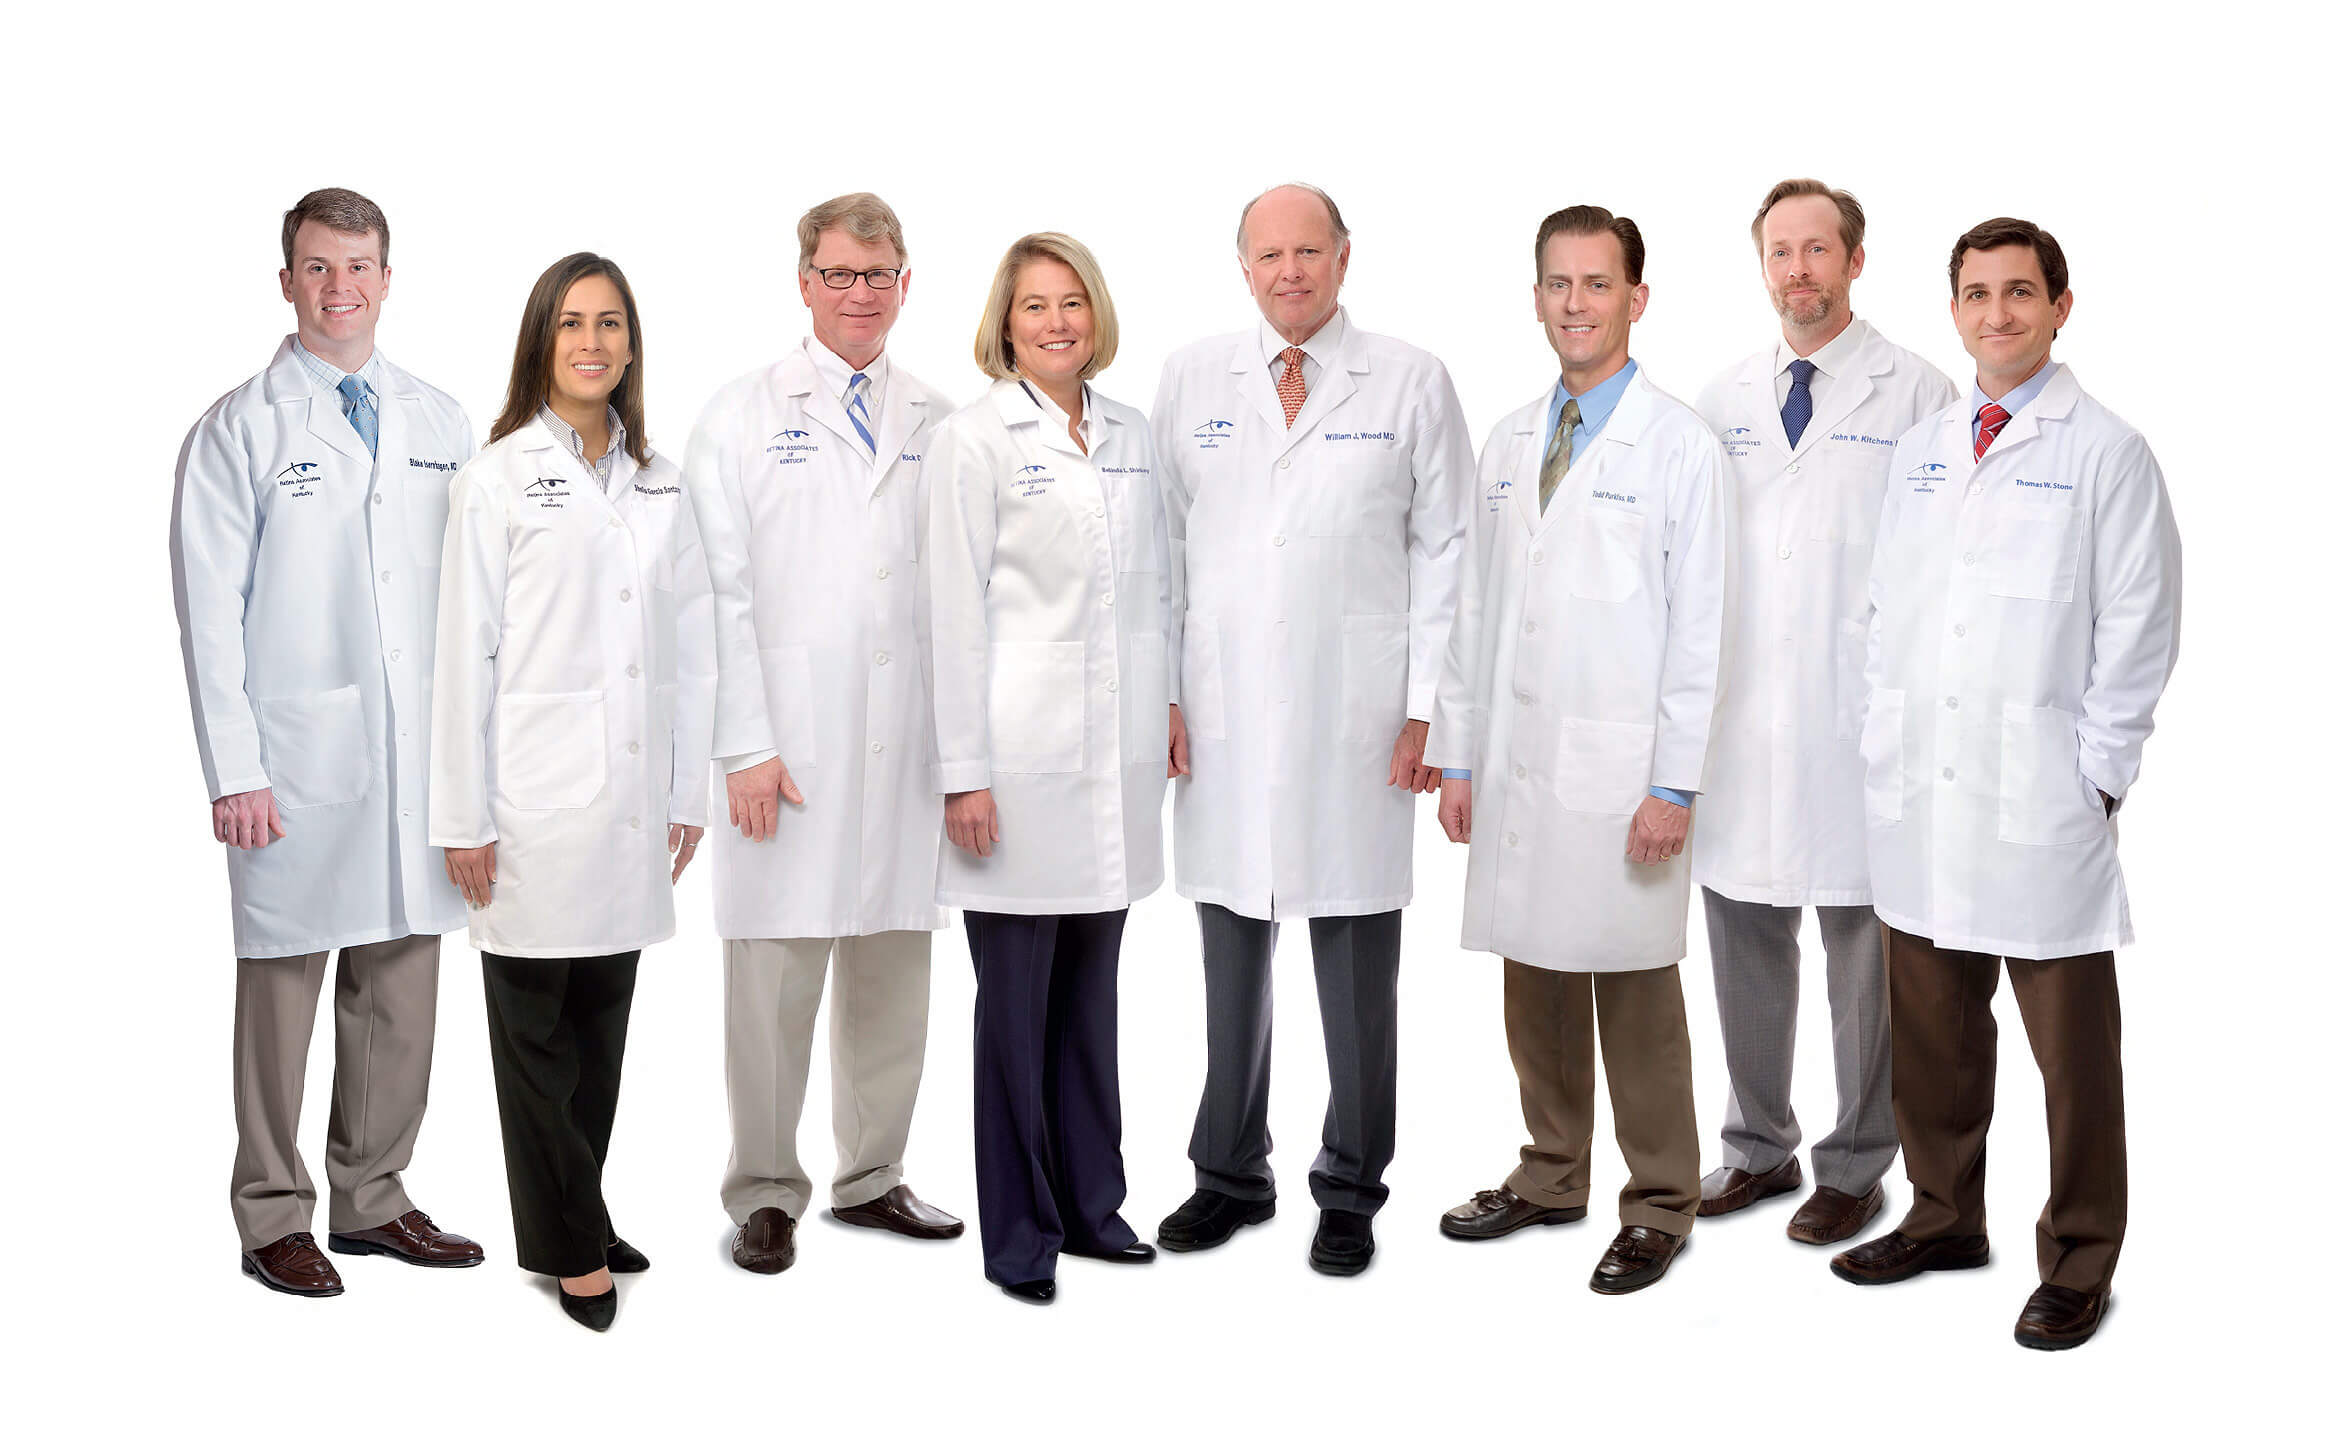 Group Shot Of Doctors